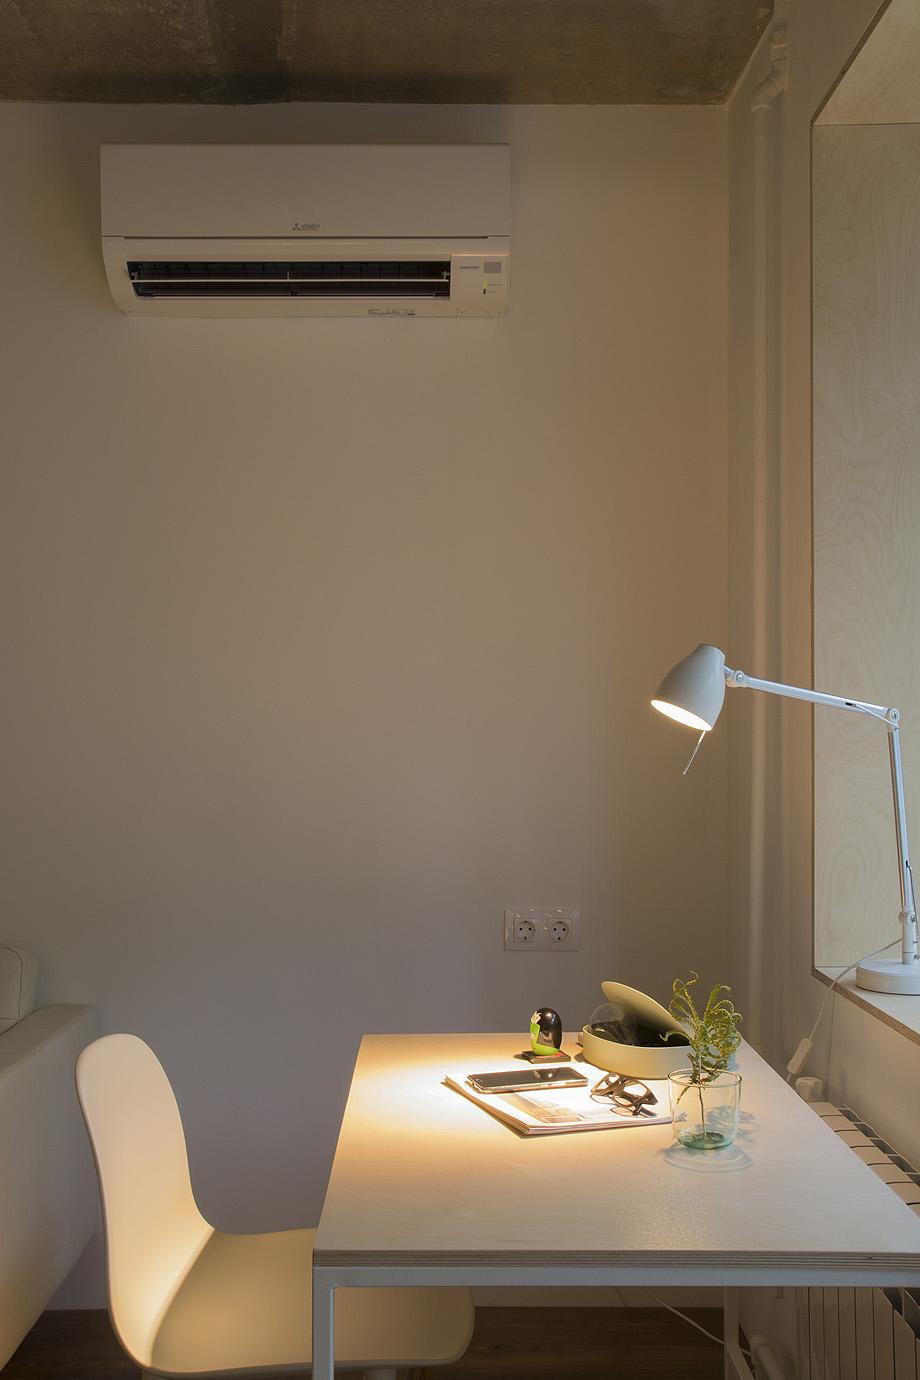 apartamento en rusia por kdva architects - foto daria koloskova (21)